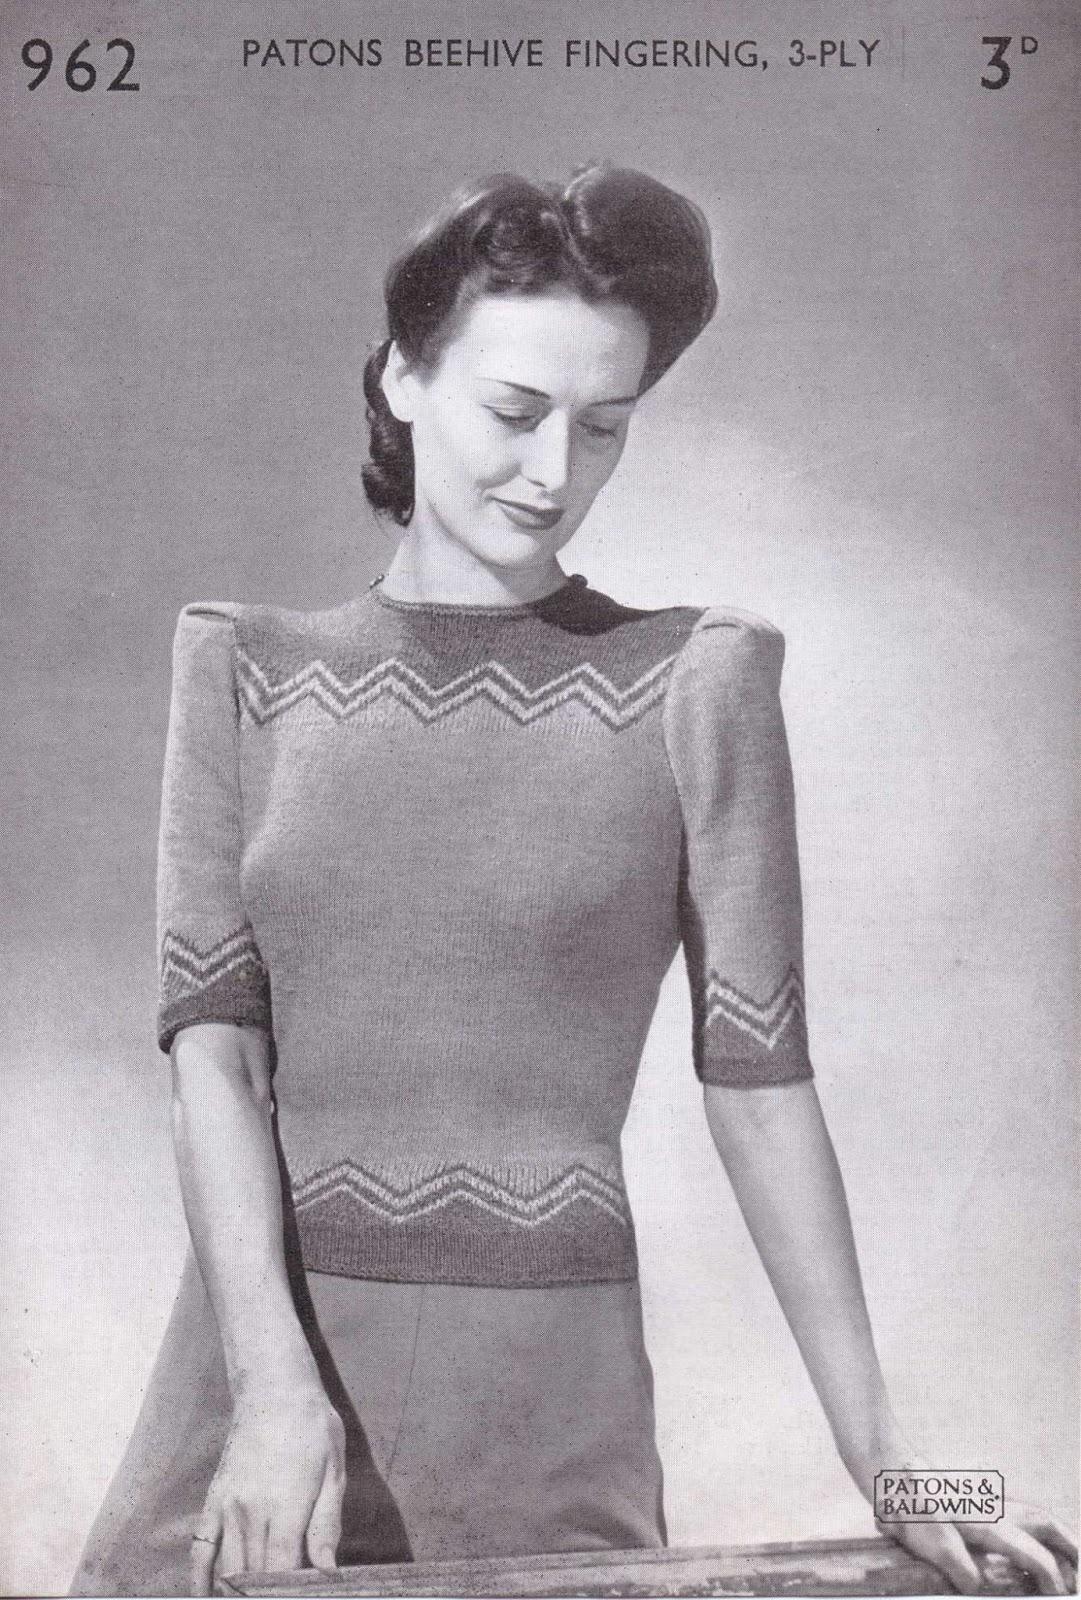 Free Vintage Knitting Patterns 1940s : The Vintage Pattern Files: 1940s Knitting - Zig Zag Top